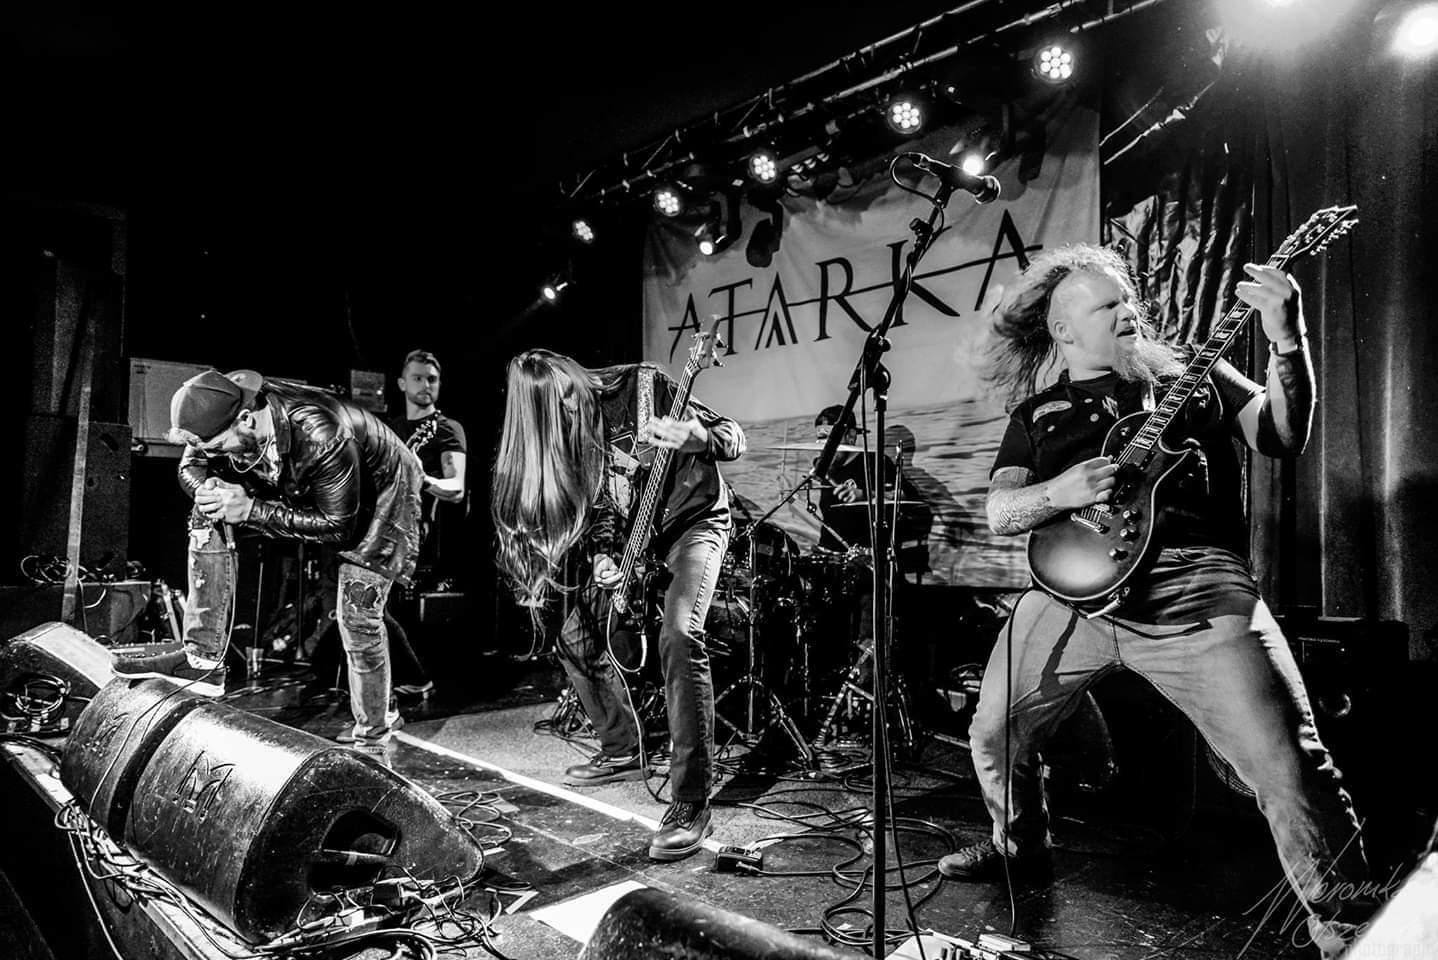 News: Birmingham Metallers Atarka Set To Release New Album